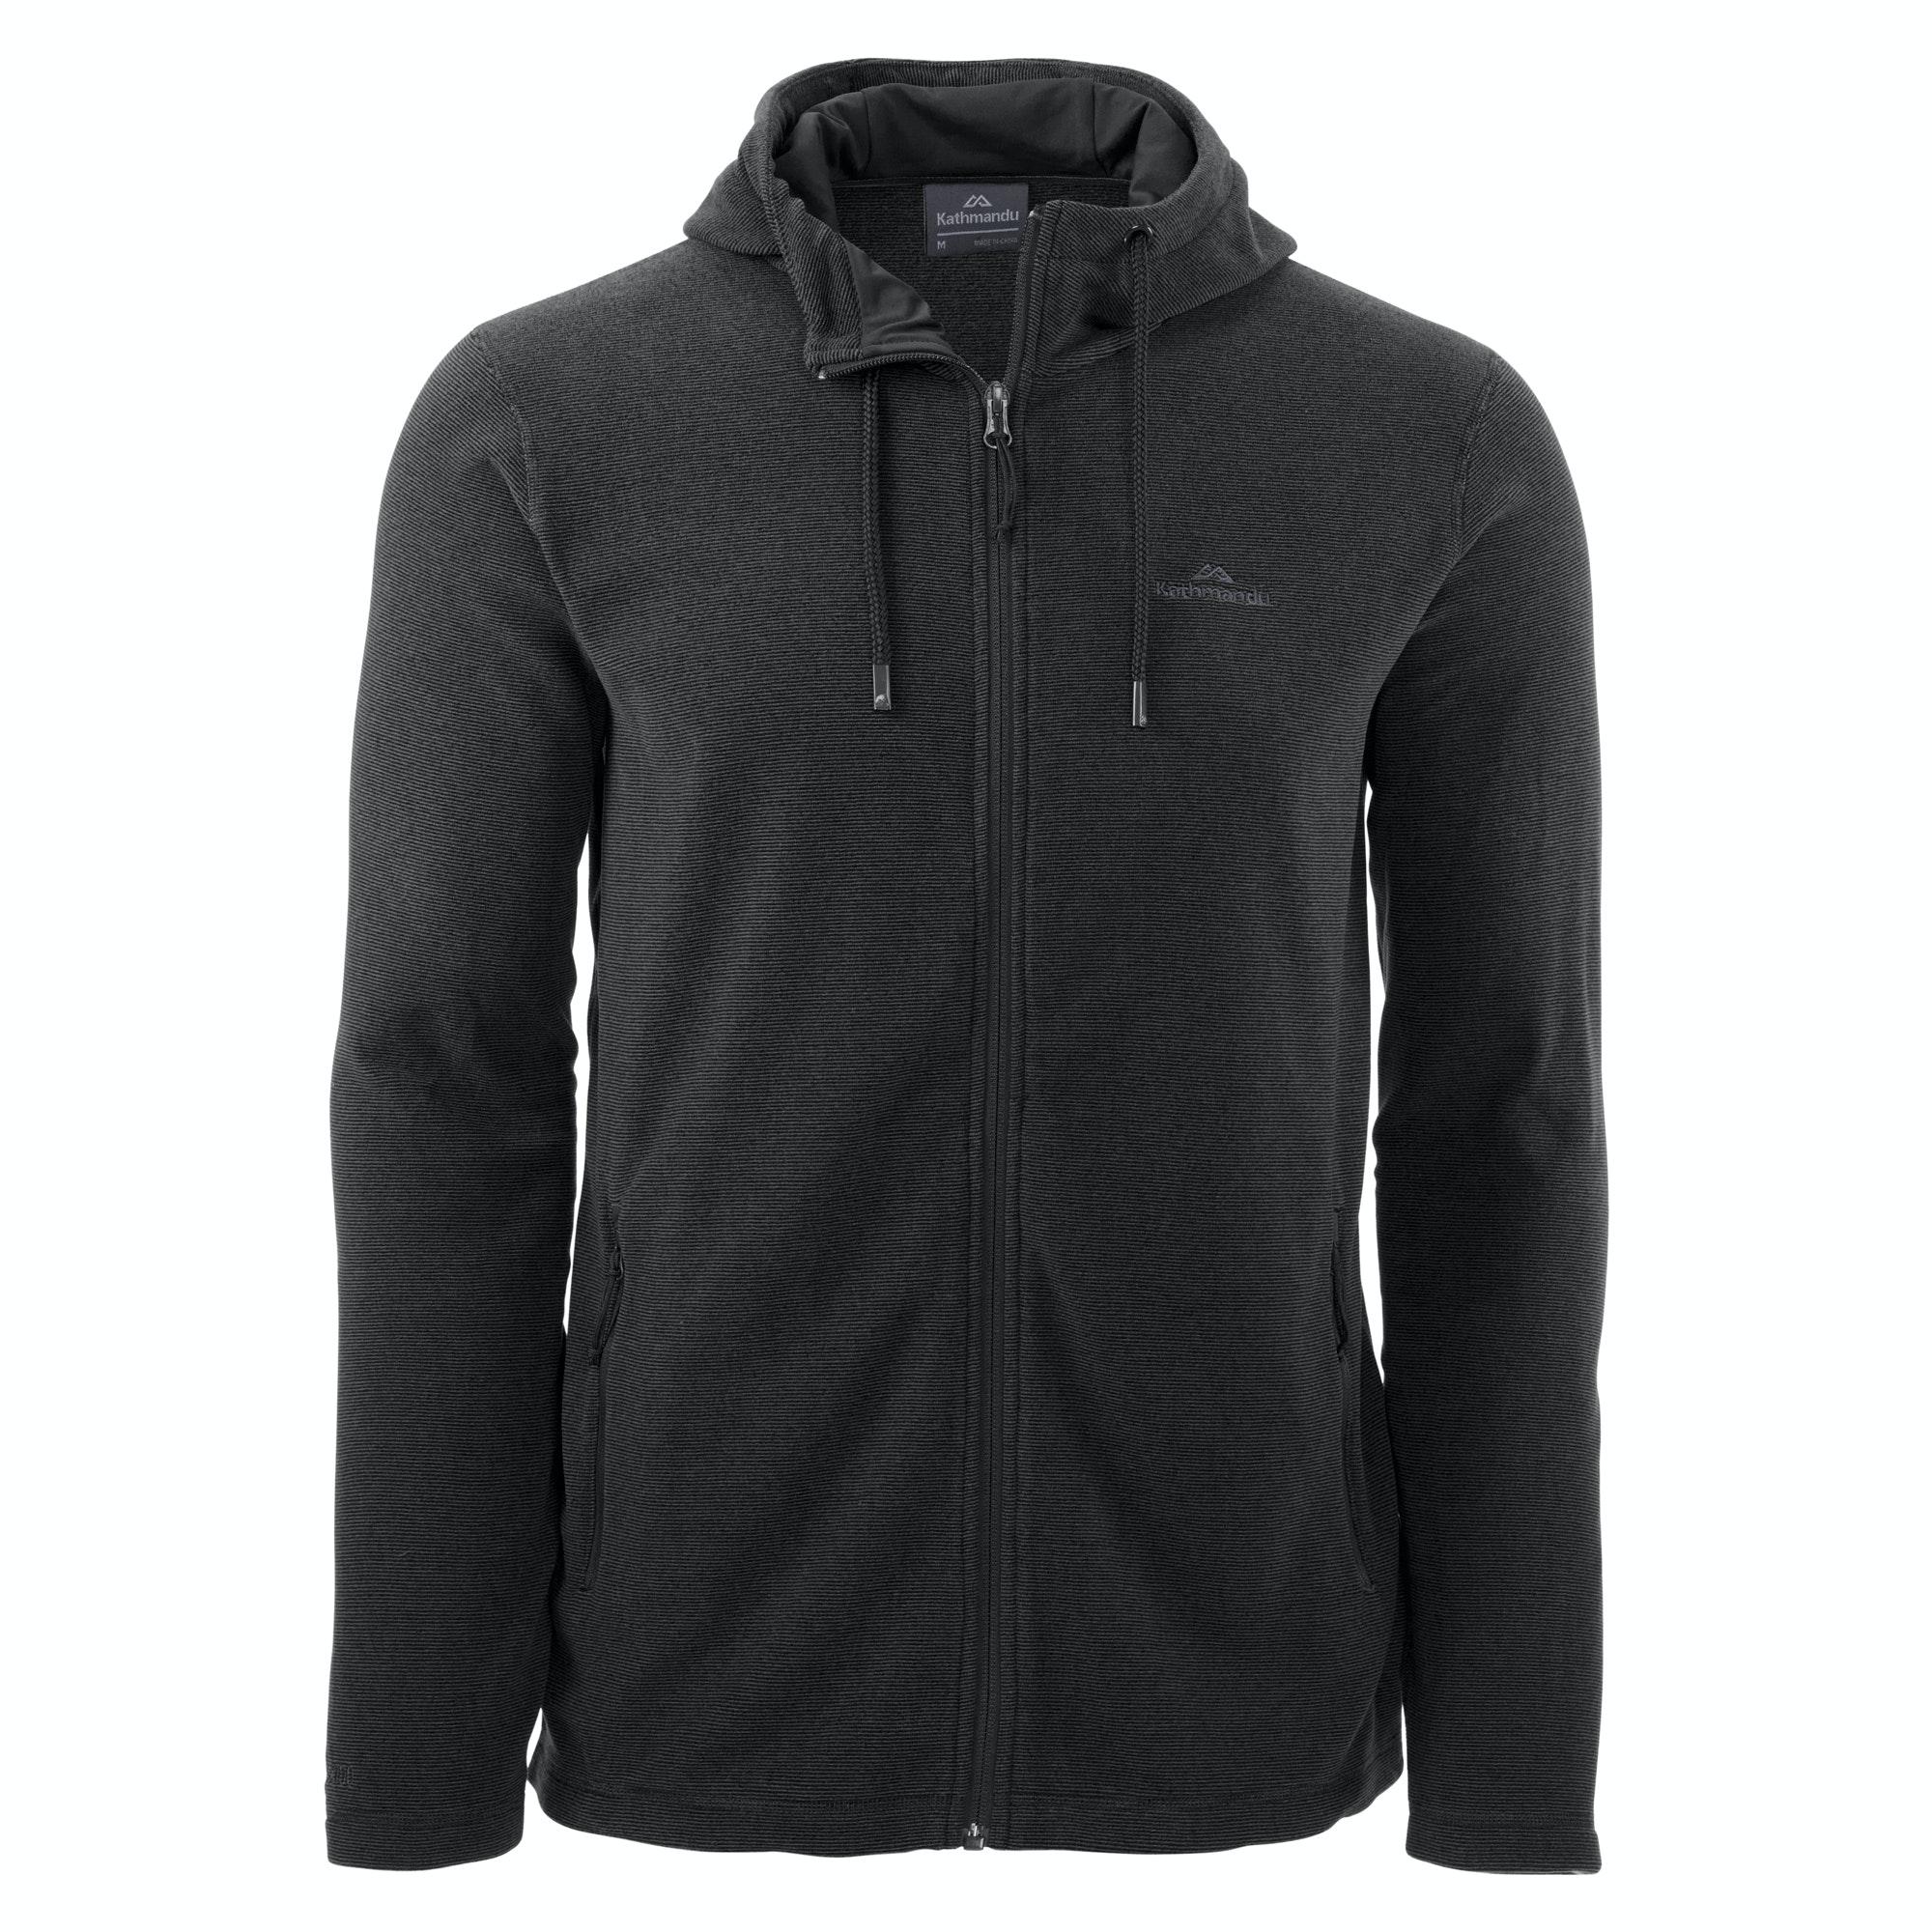 Mens lightweight hoodie